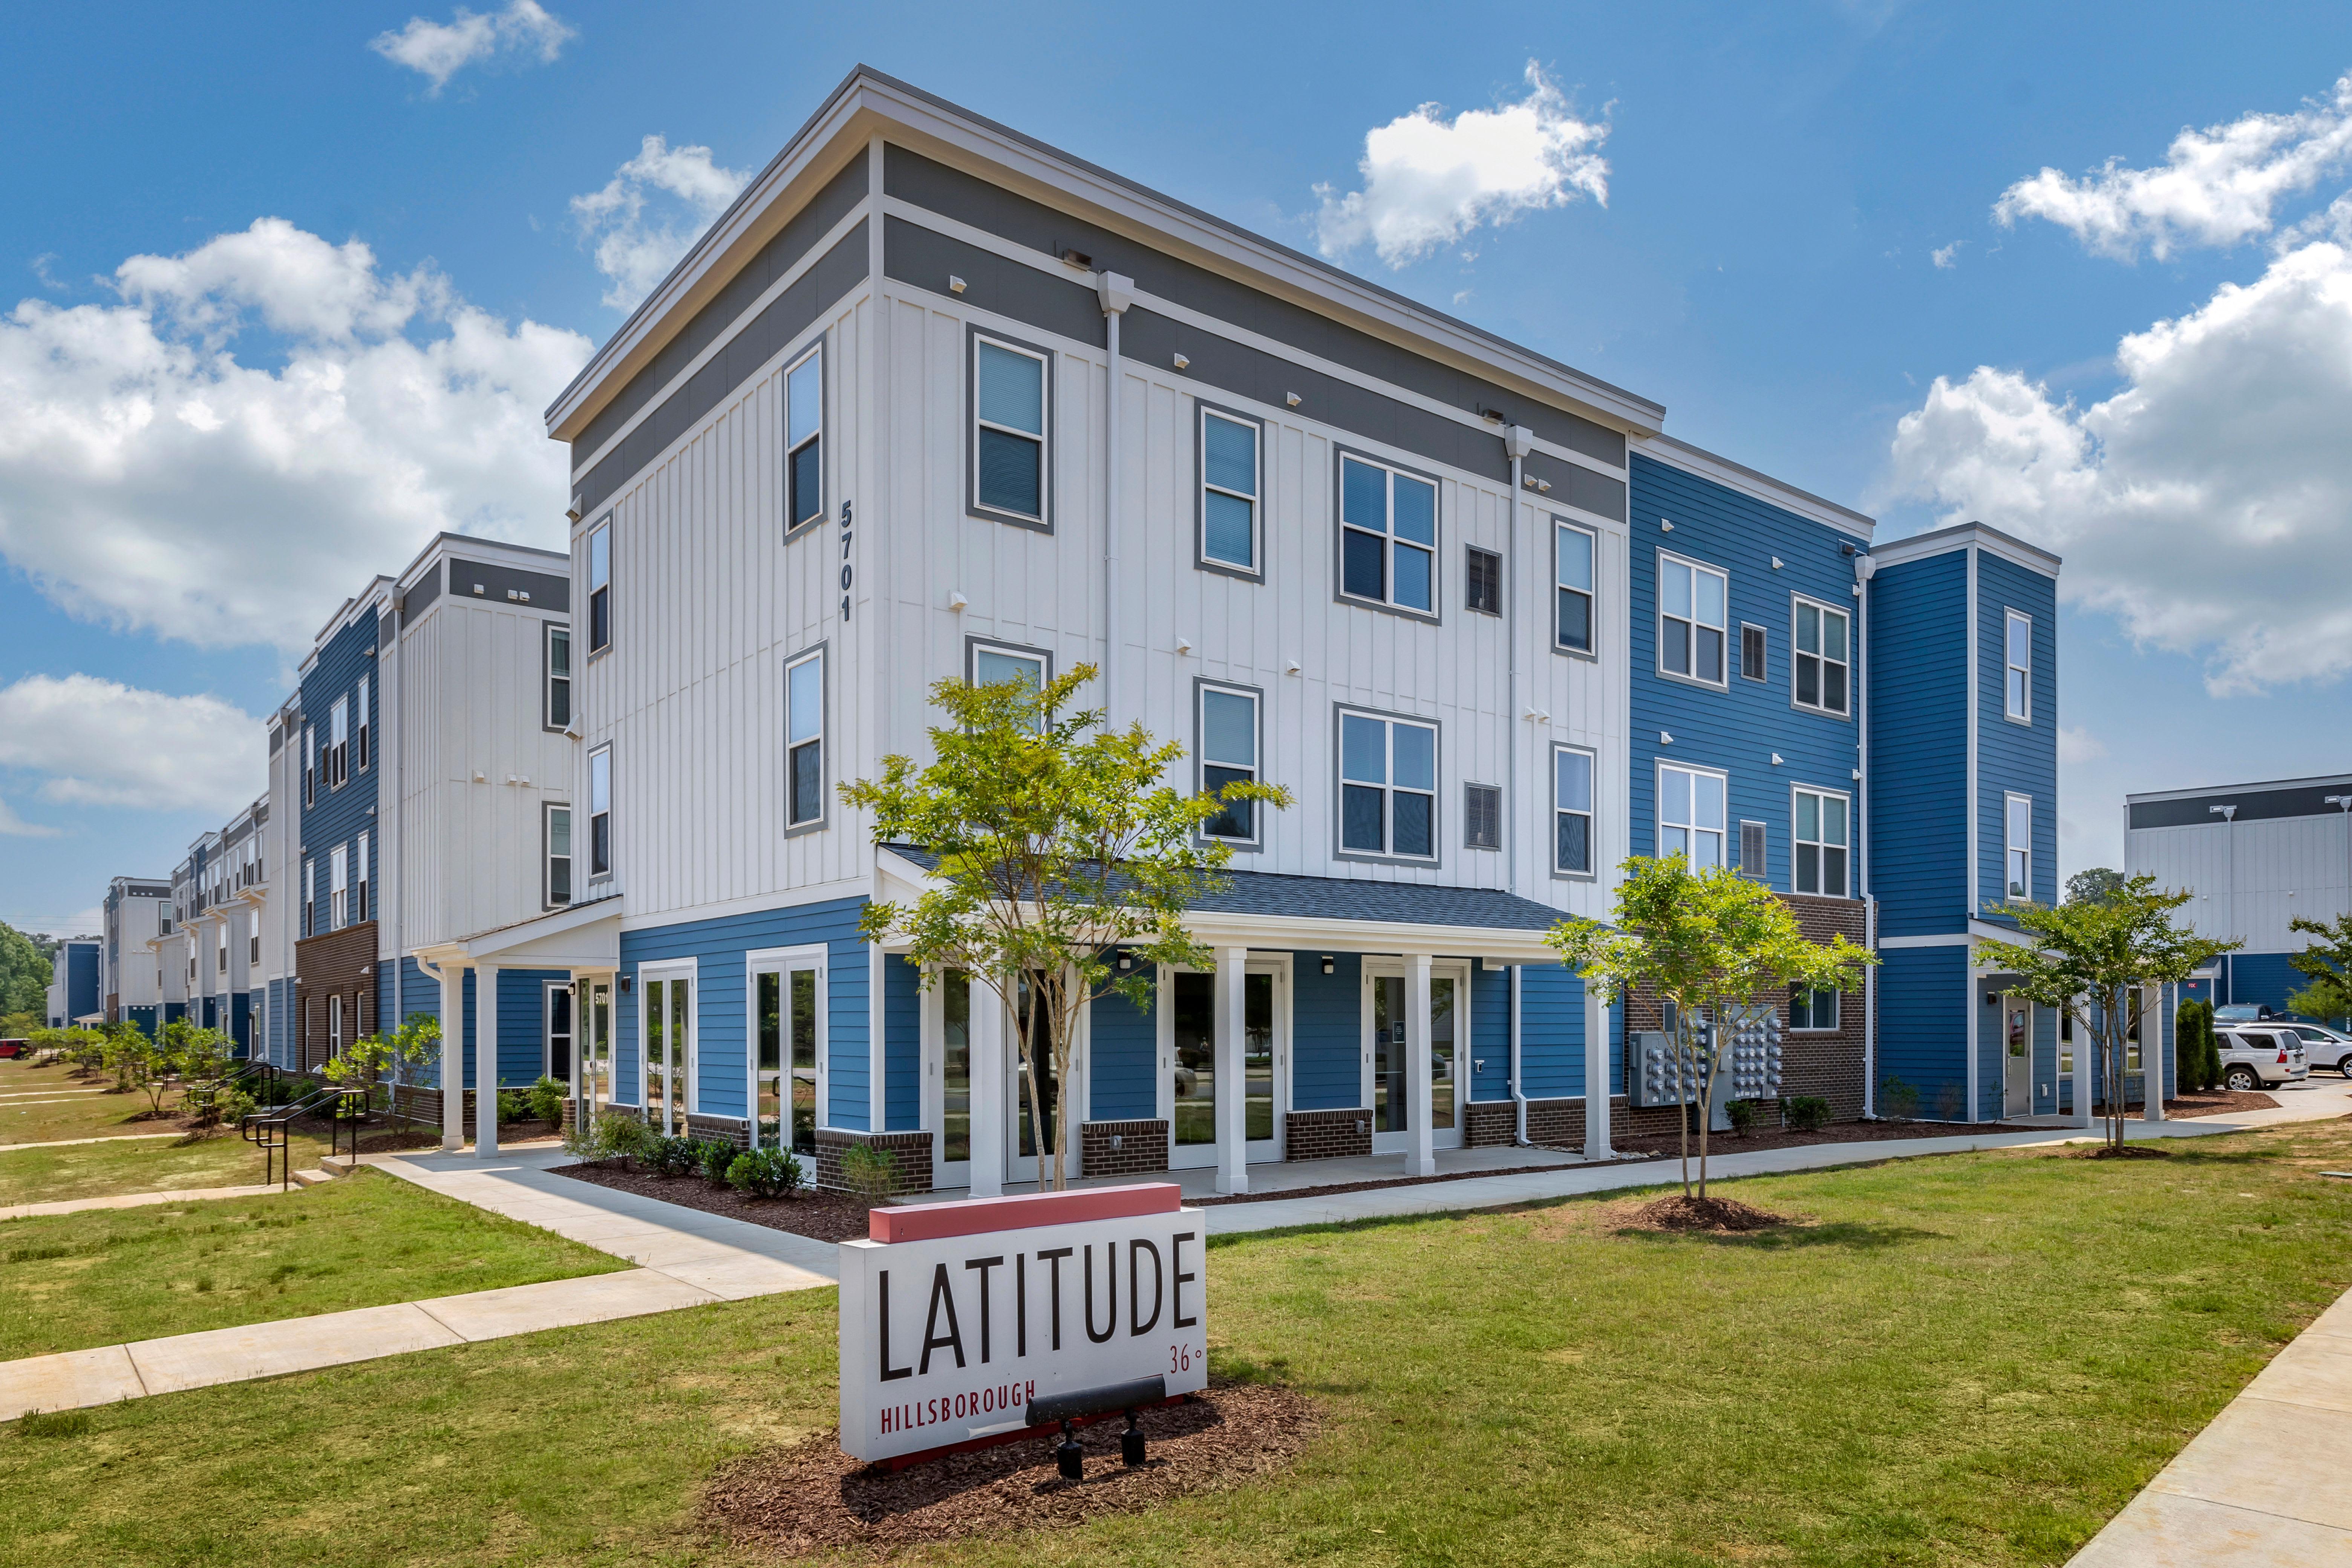 Exterior of LATITUDE on Hillsborough in Raleigh, North Carolina